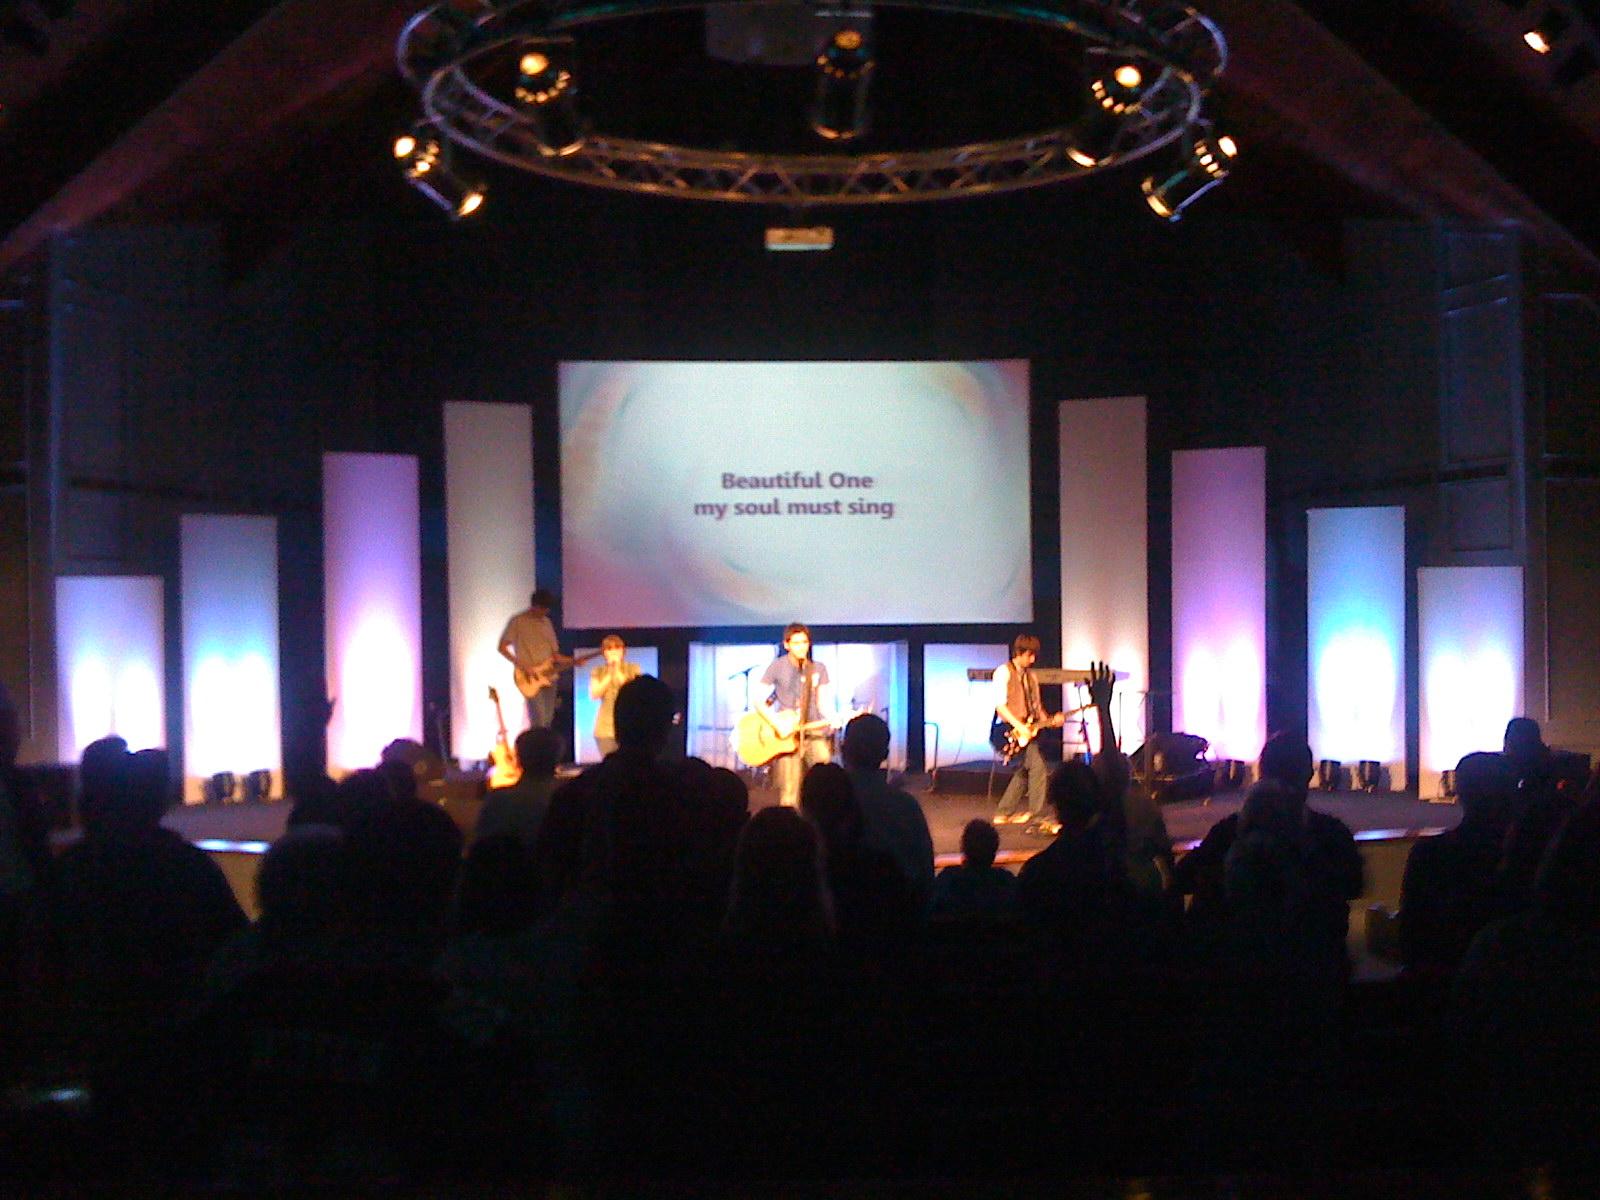 church lighting ideas. Raising The Bar Church Lighting Ideas